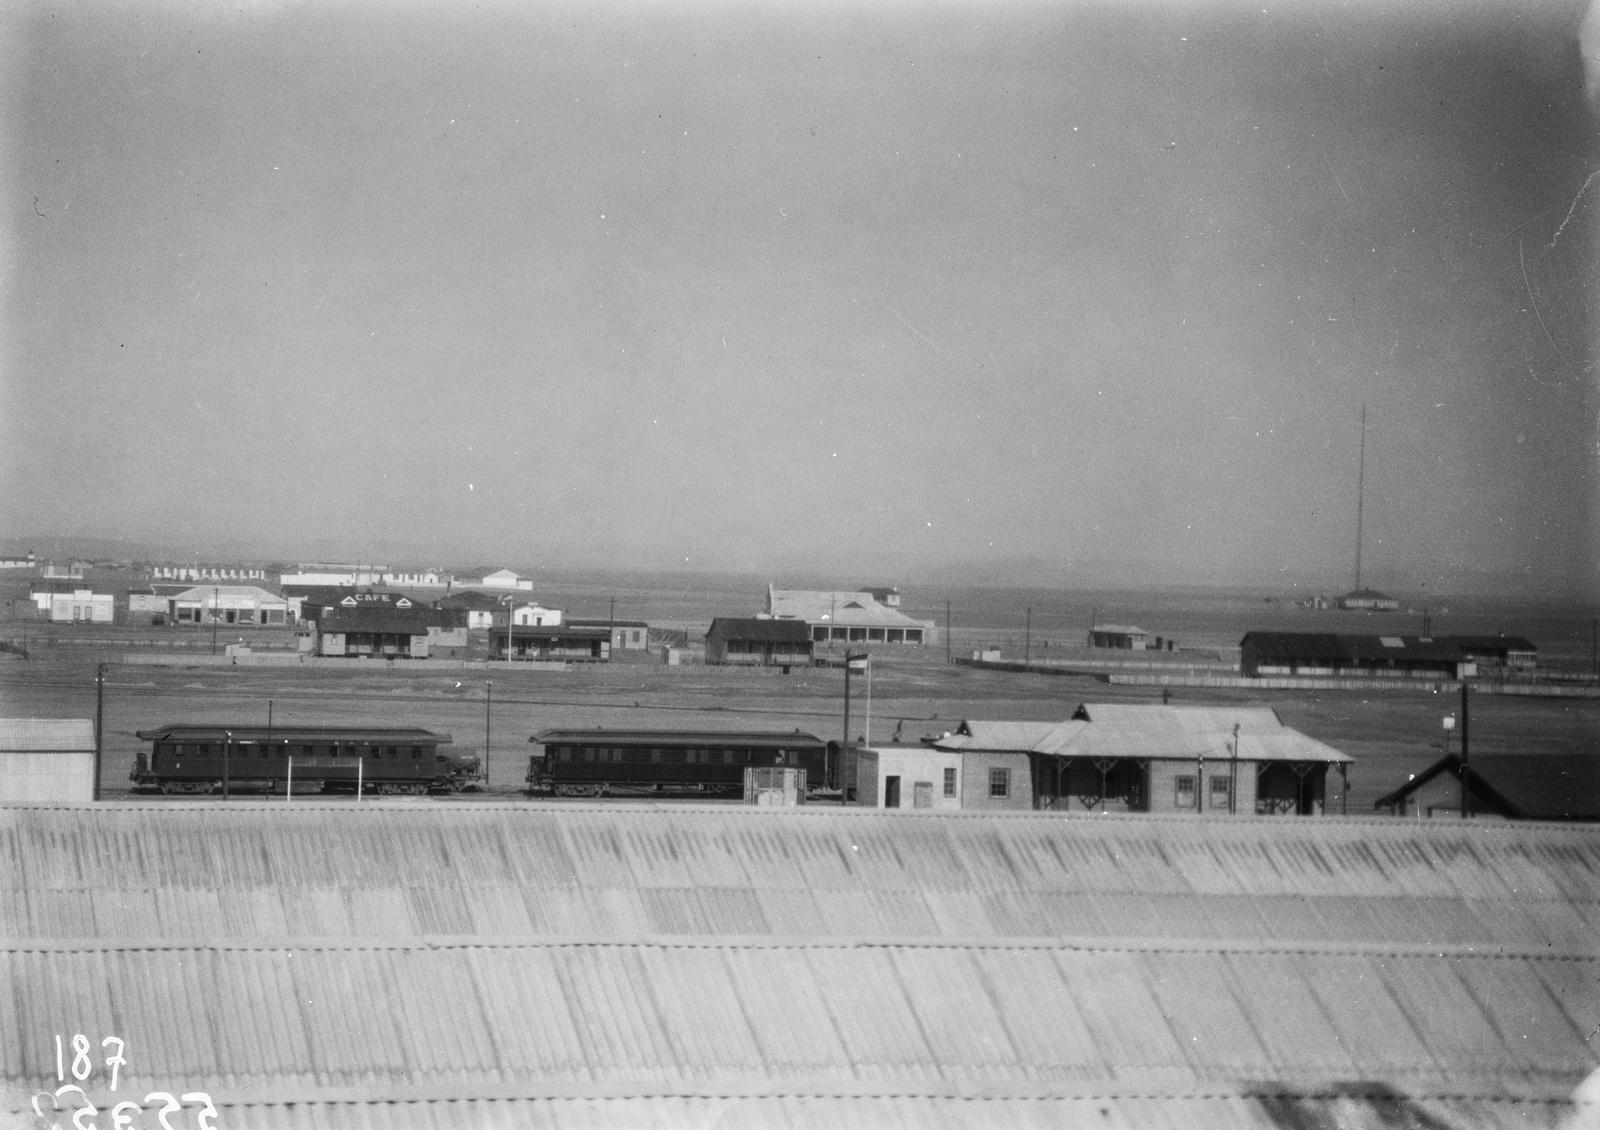 Южно-Африканский Союз. Кейптаун. Вид на гавань и железную дорогу